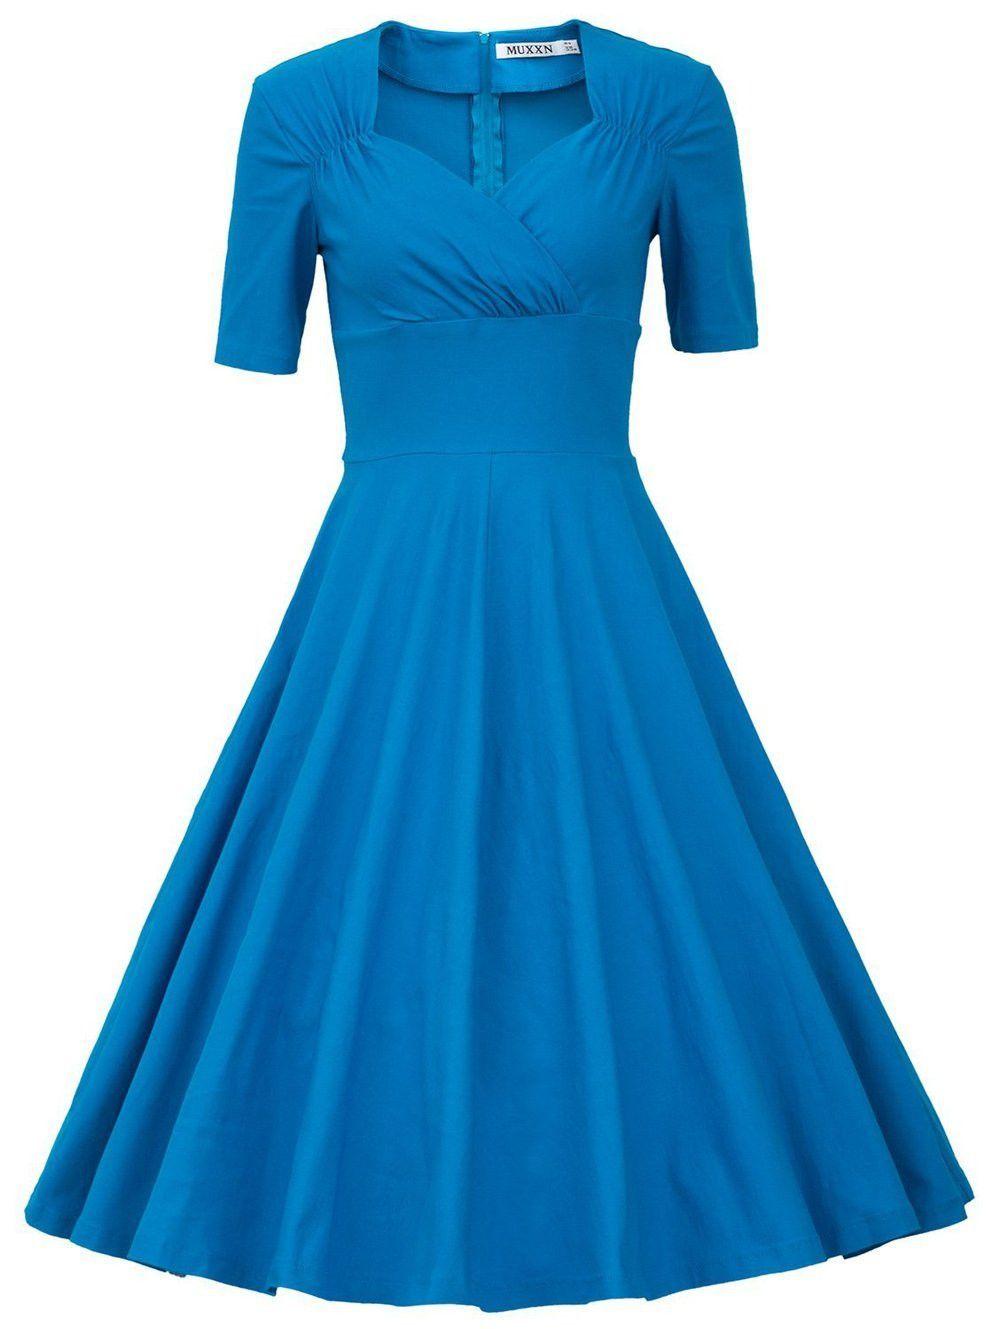 Audrey Hepburn vintage 50s 60s ball gown dress V-neck solid tunic ...